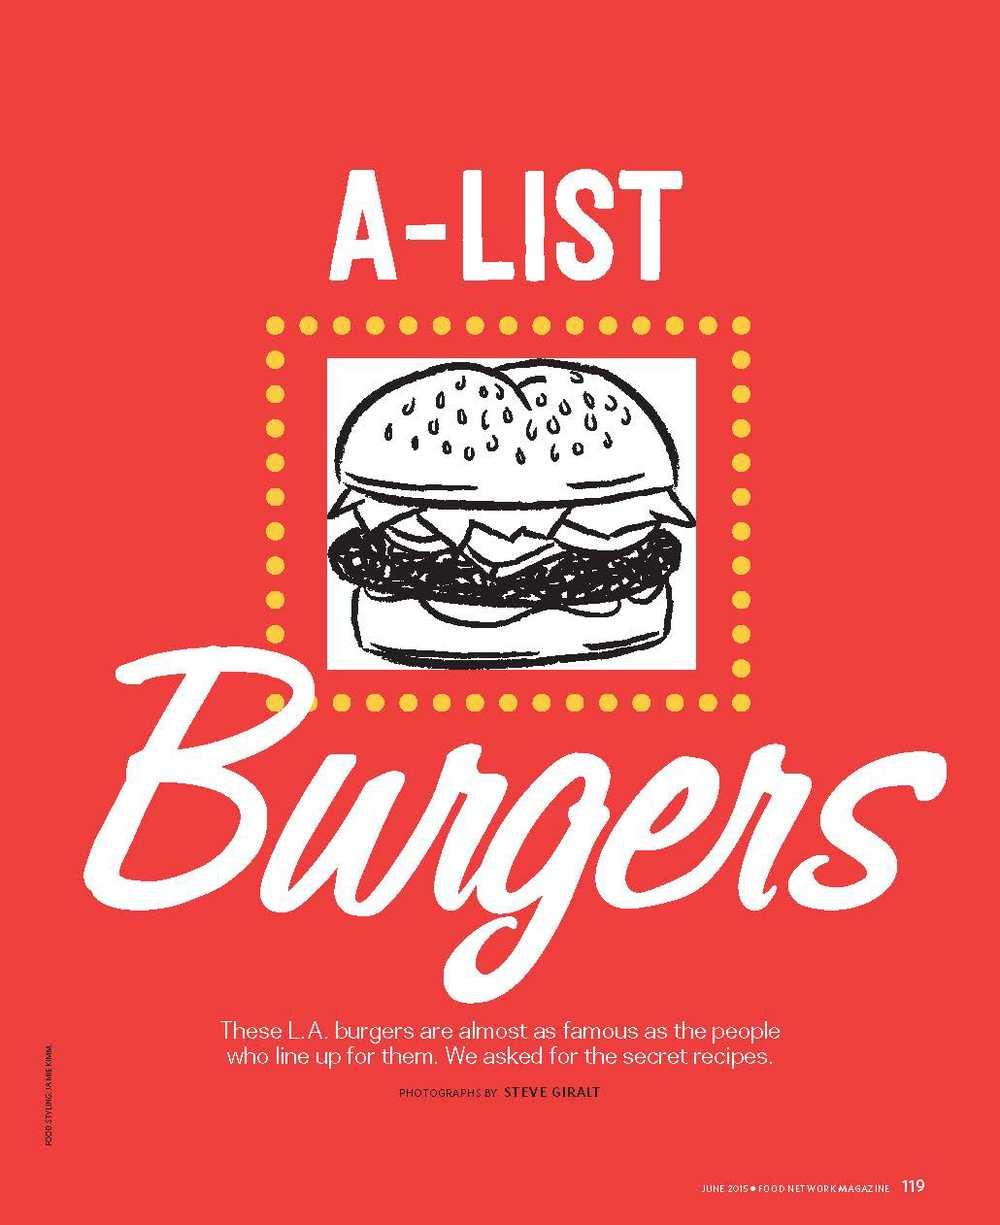 Copyright © 2015 Food Network Magazine